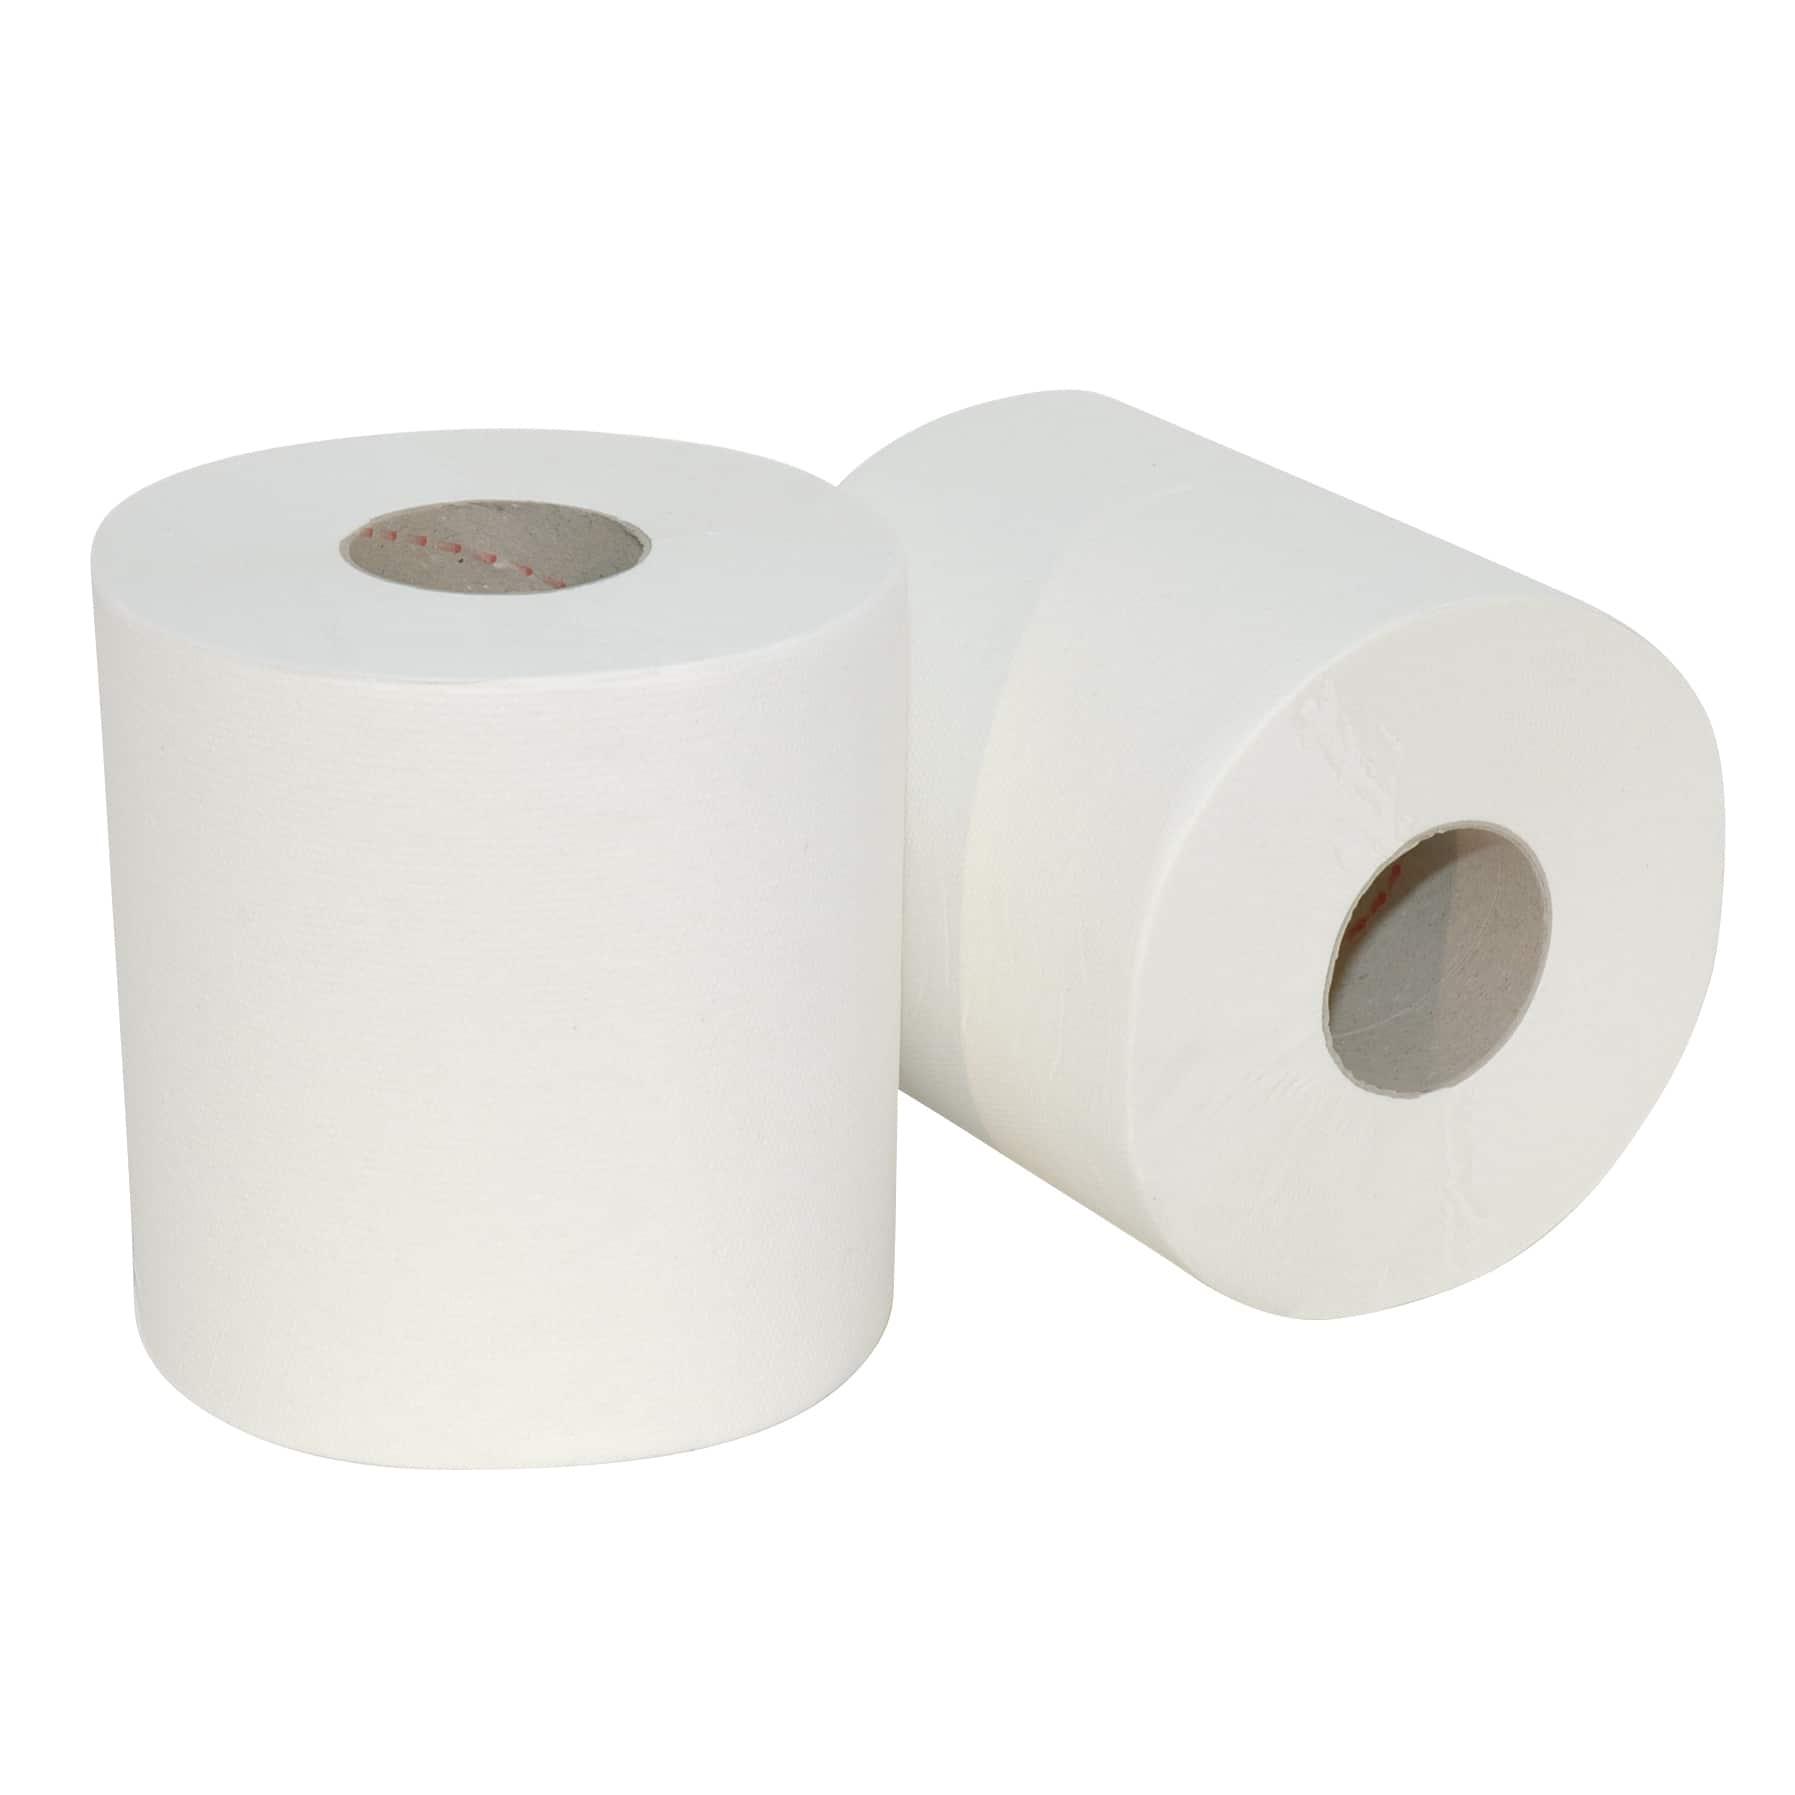 Midi poetspapier cellulose 2-laags (6 rollen)